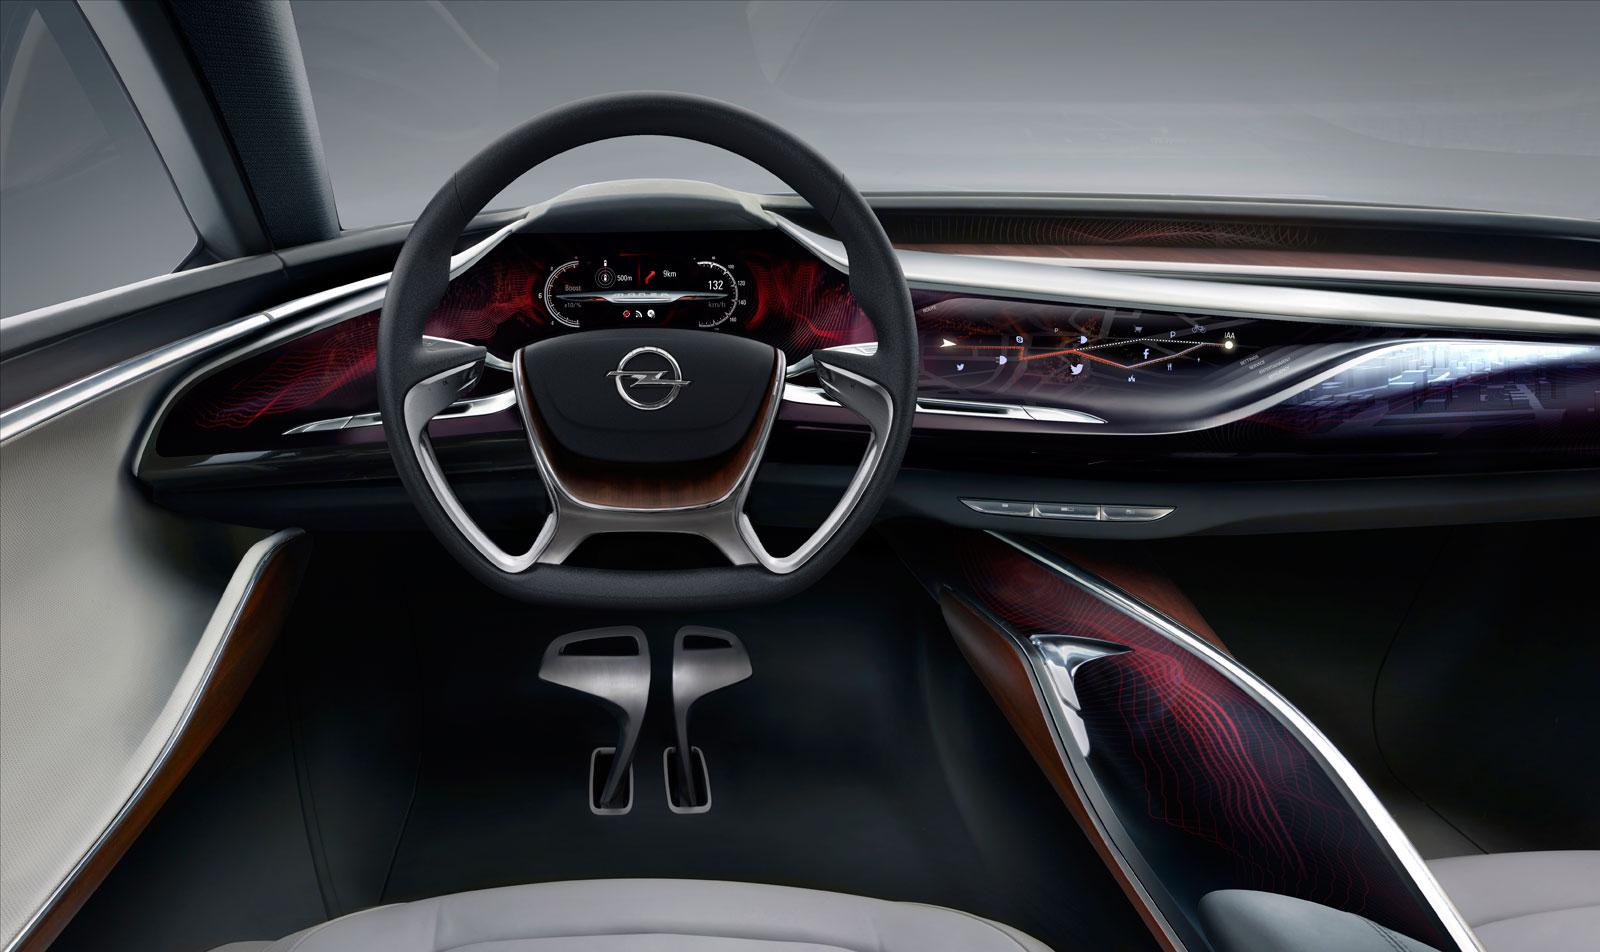 2013 Opel Monza - Concepts